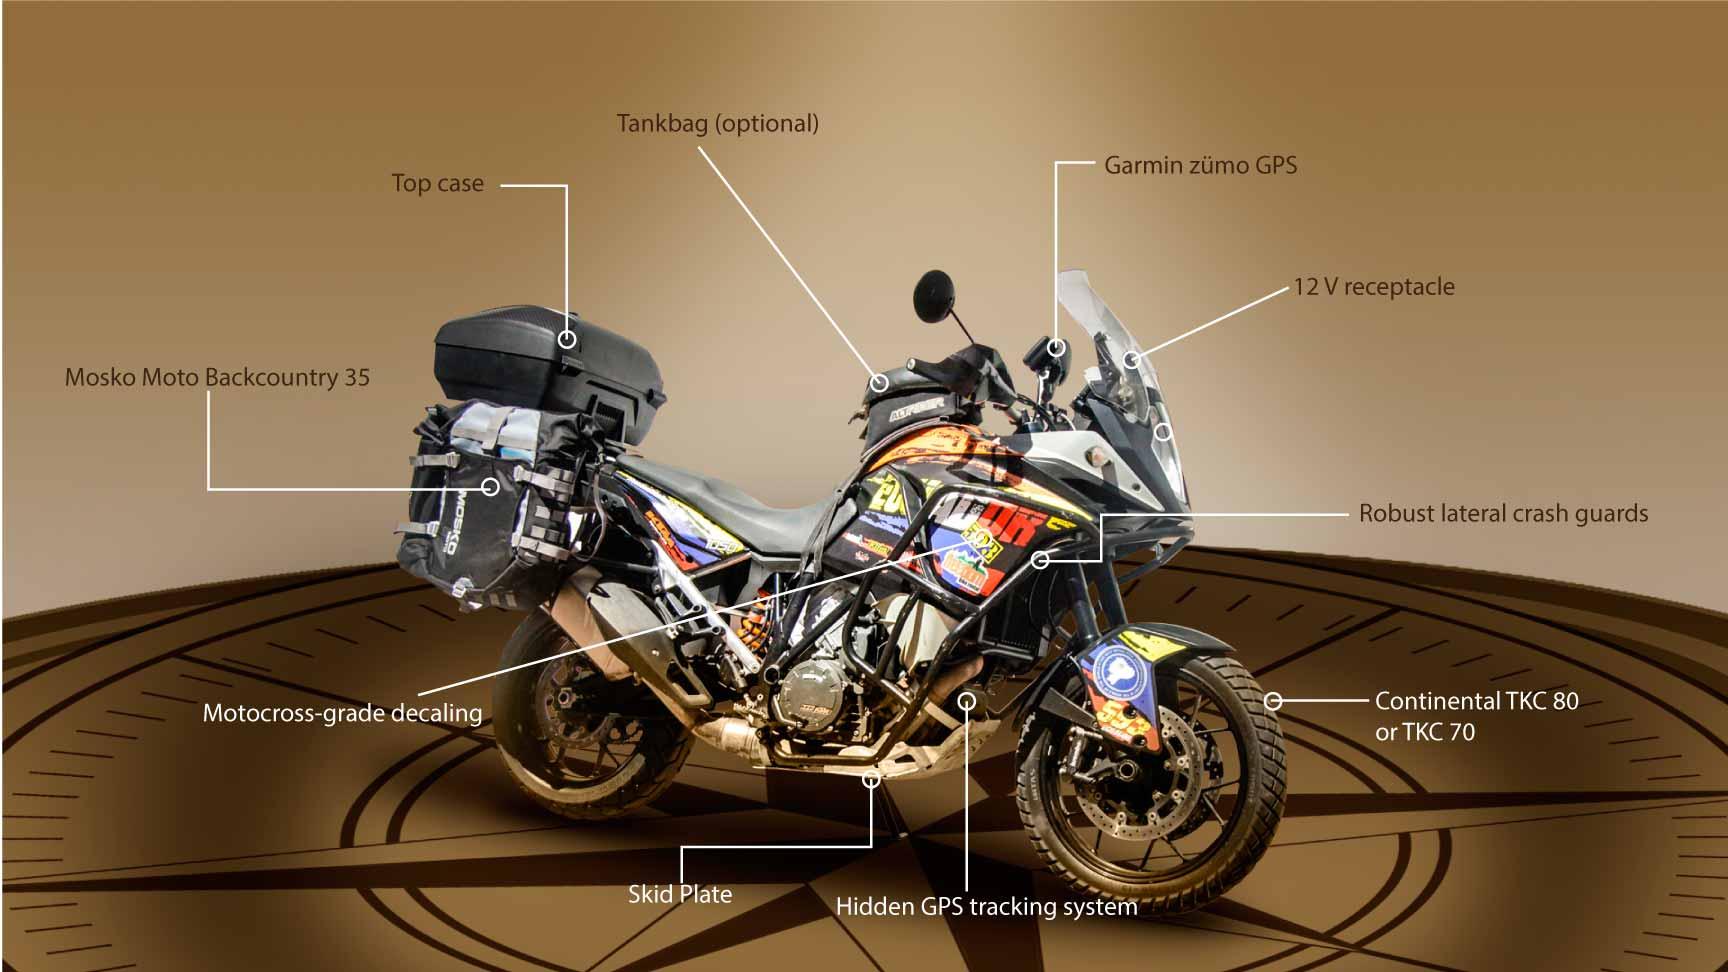 Motorcycle Adventure Tours Motorcycle & 4x4 Rental- Ecuador